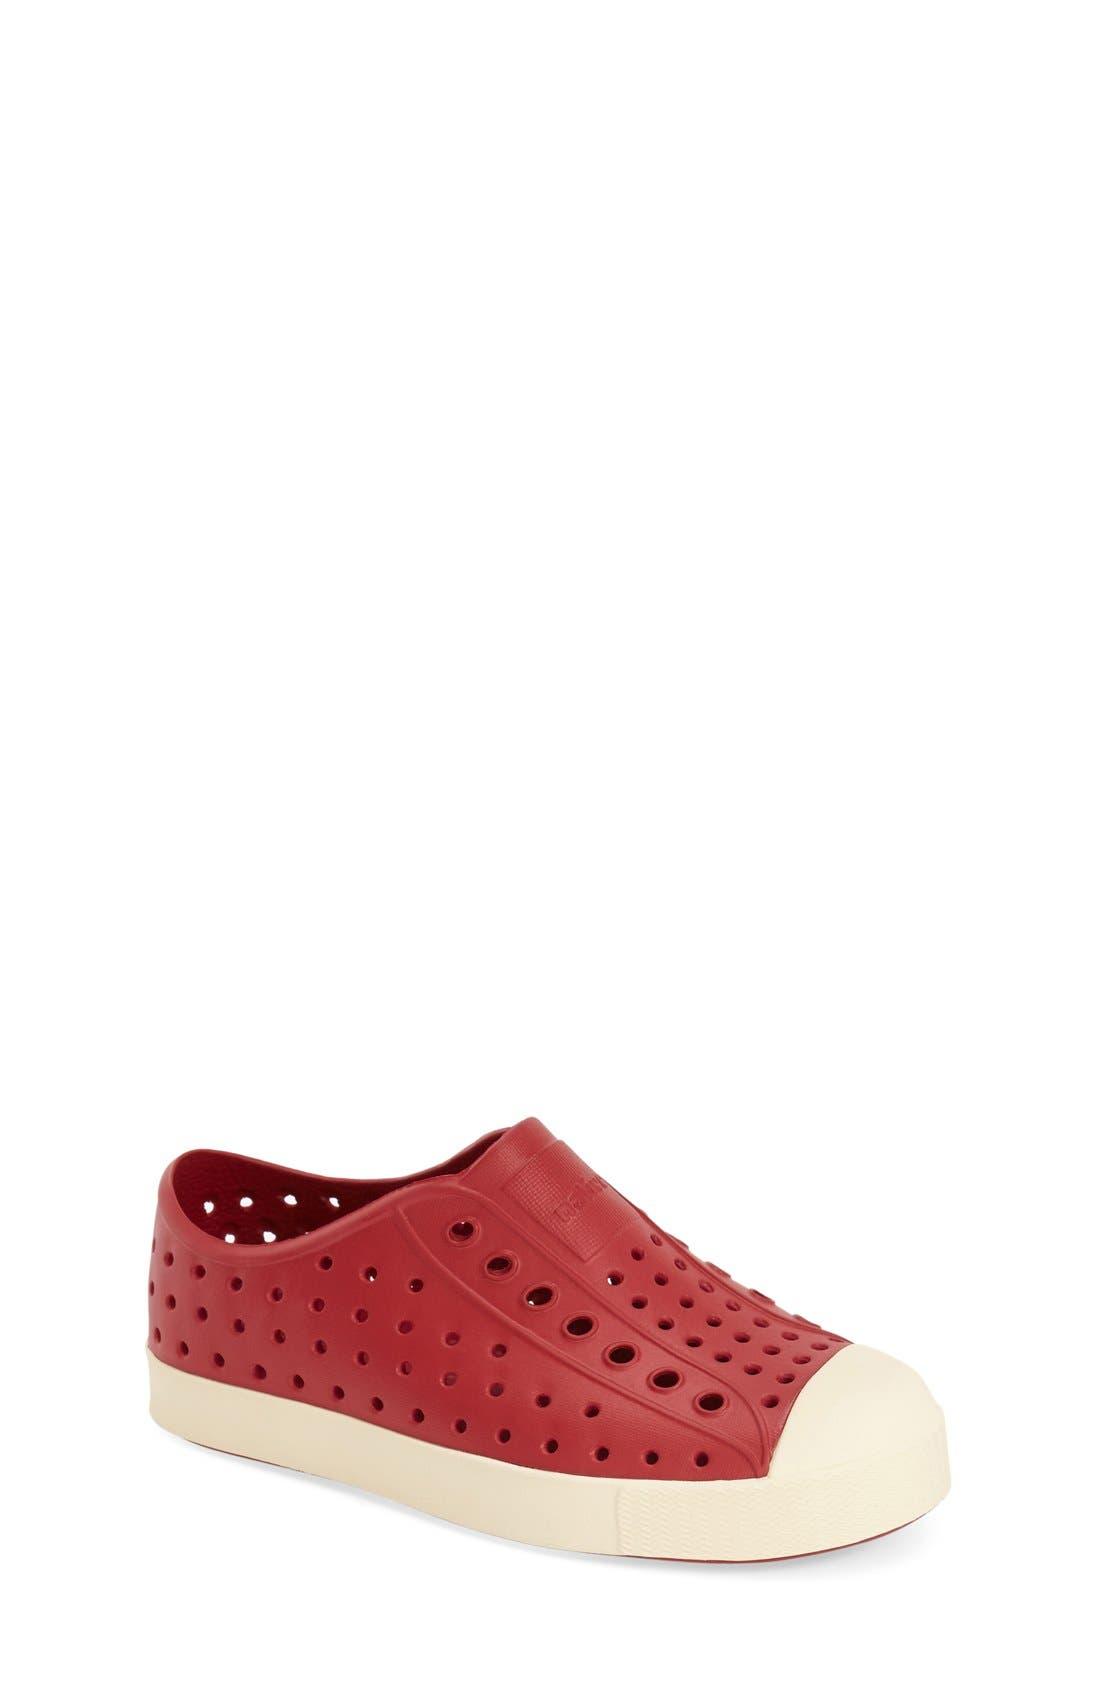 'Jefferson' Water Friendly Slip-On Sneaker,                             Main thumbnail 55, color,